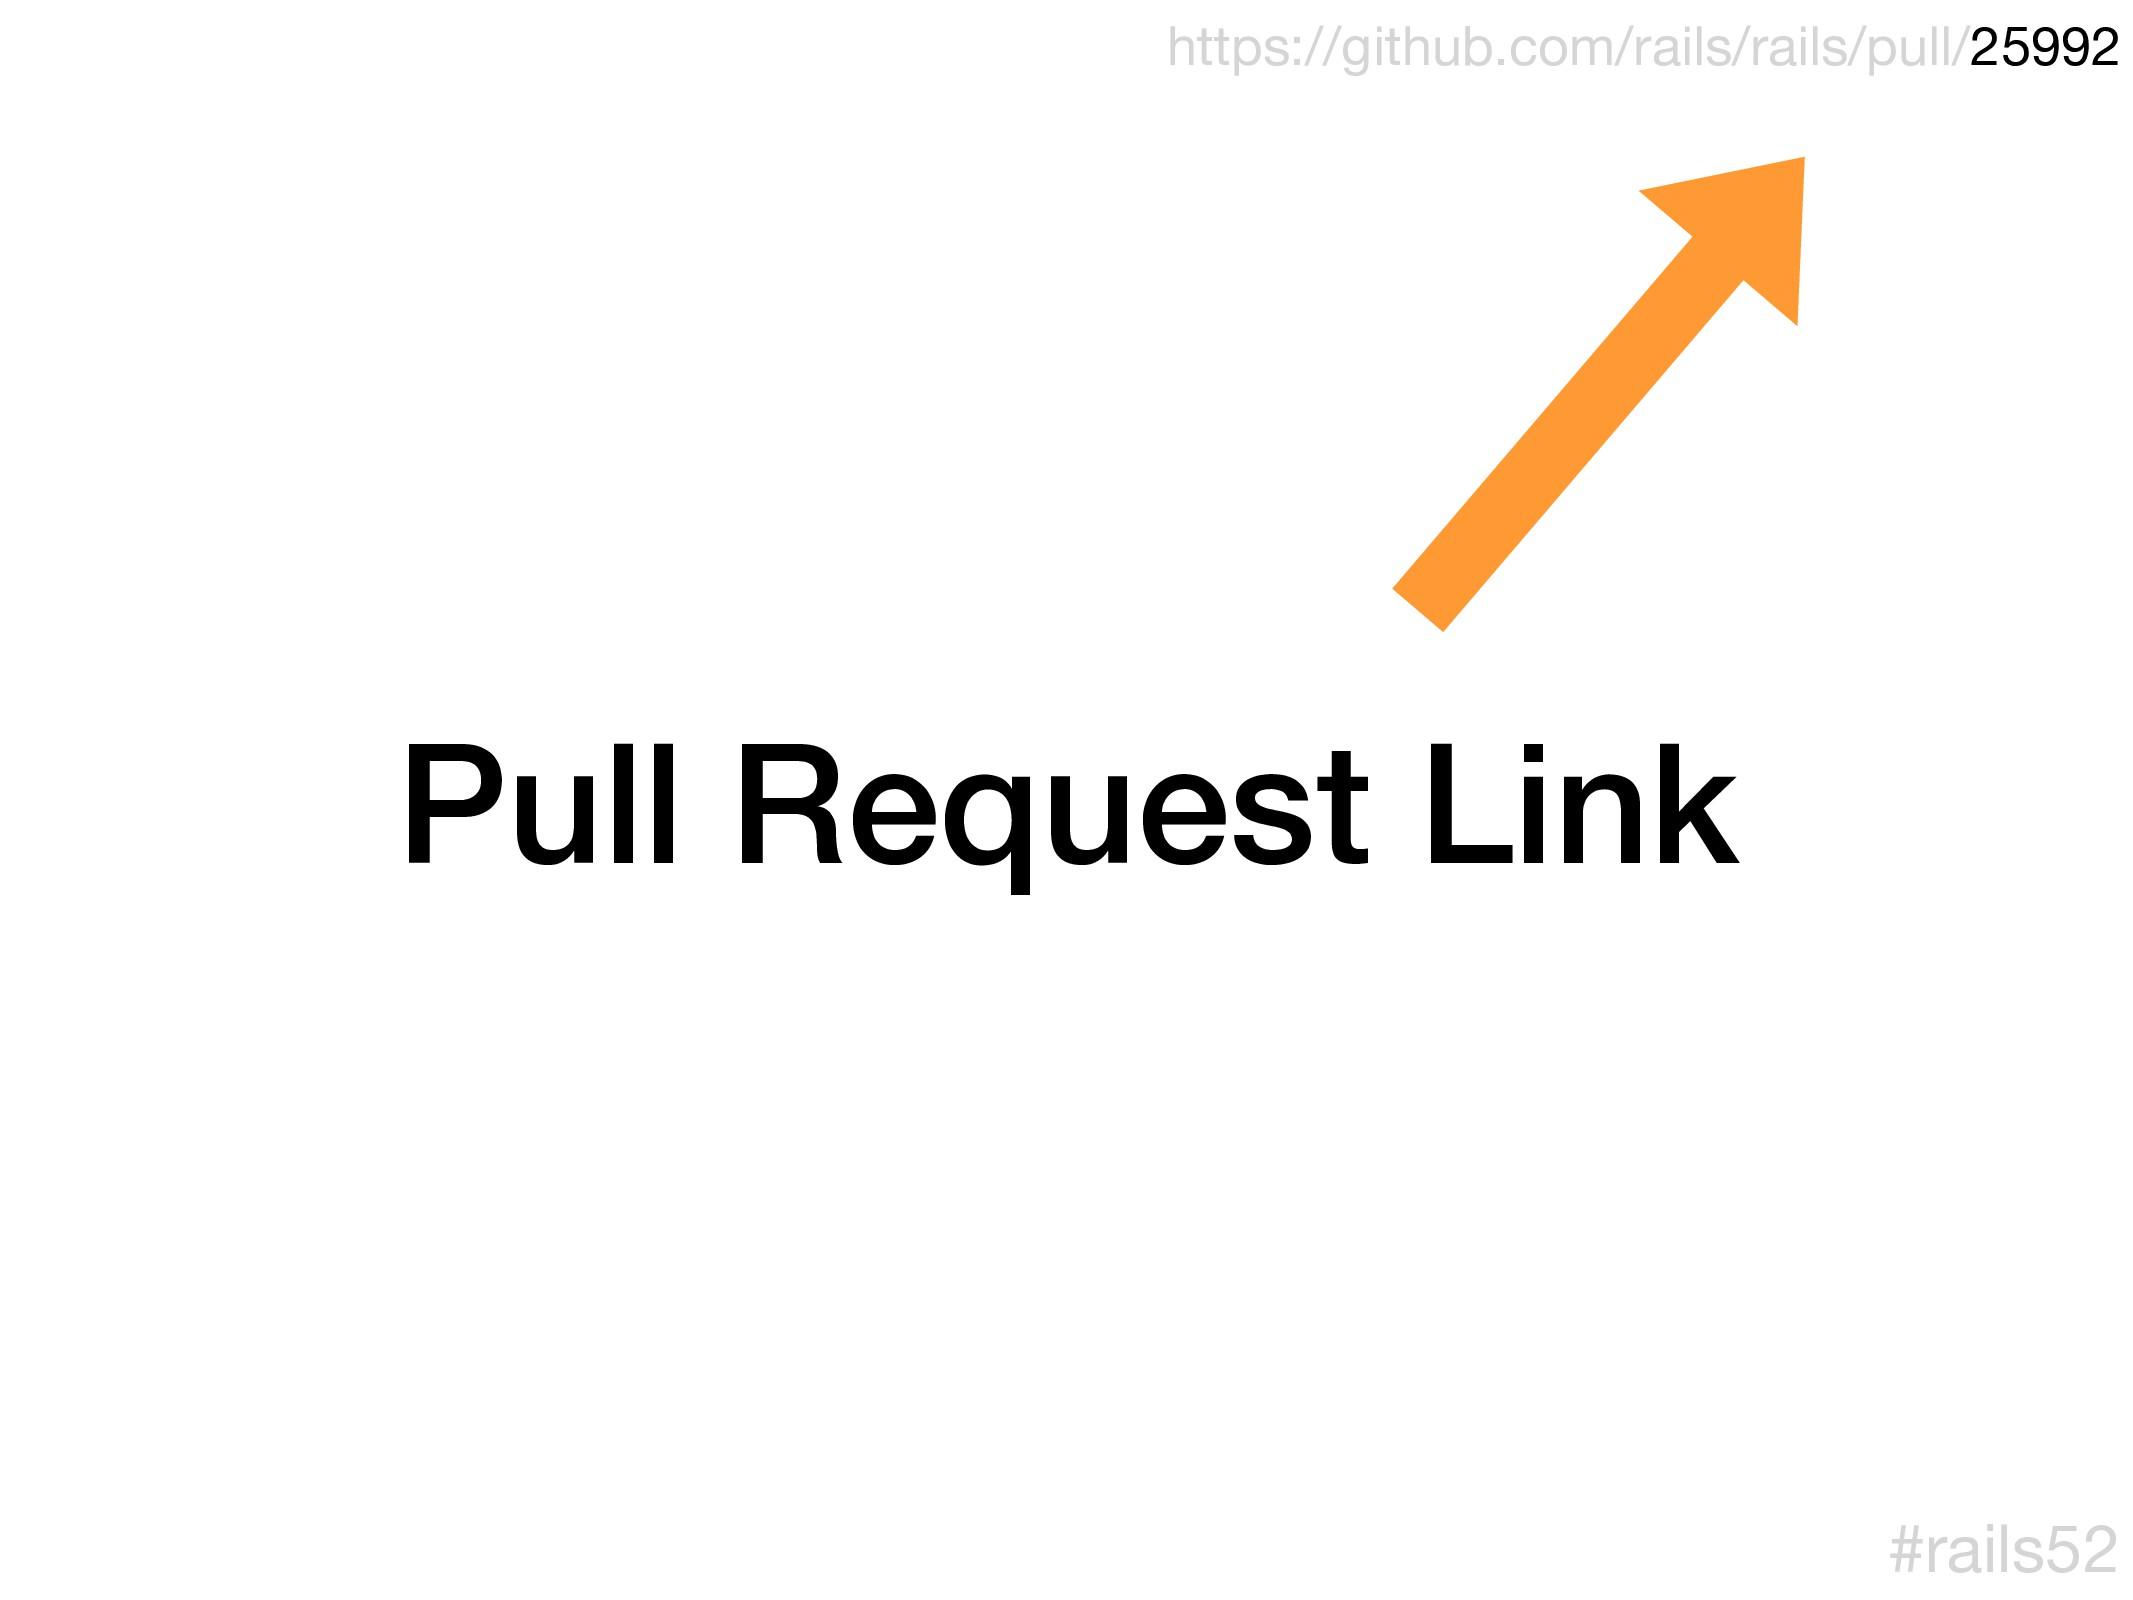 Pull Request Link https://github.com/rails/rail...